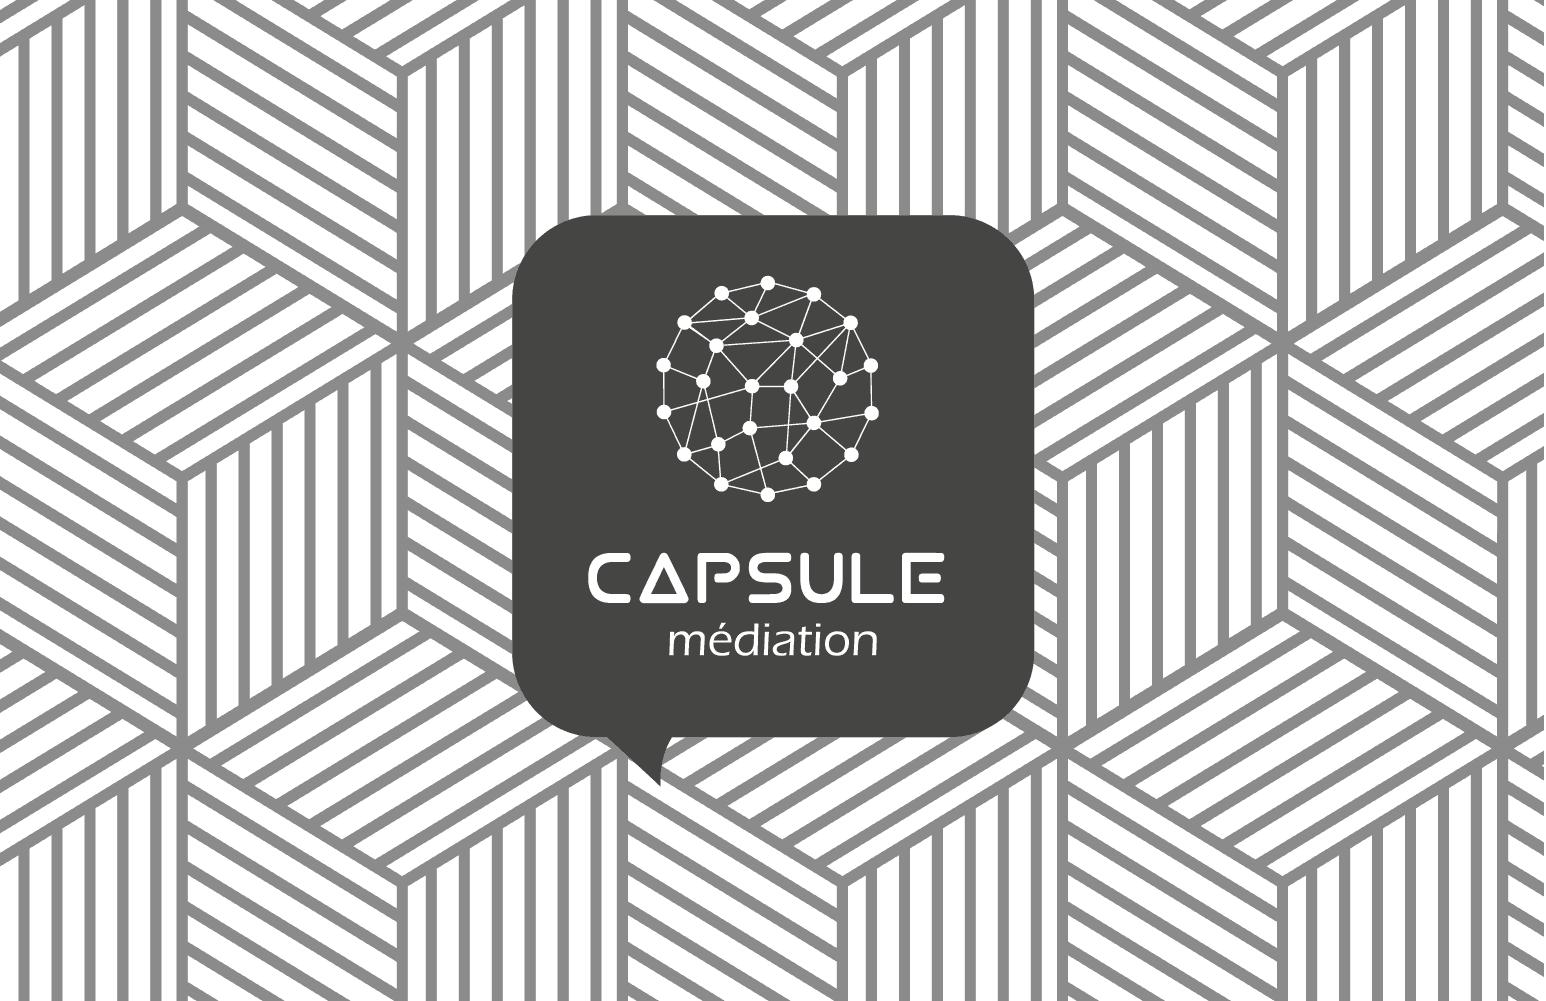 Capsule médiation